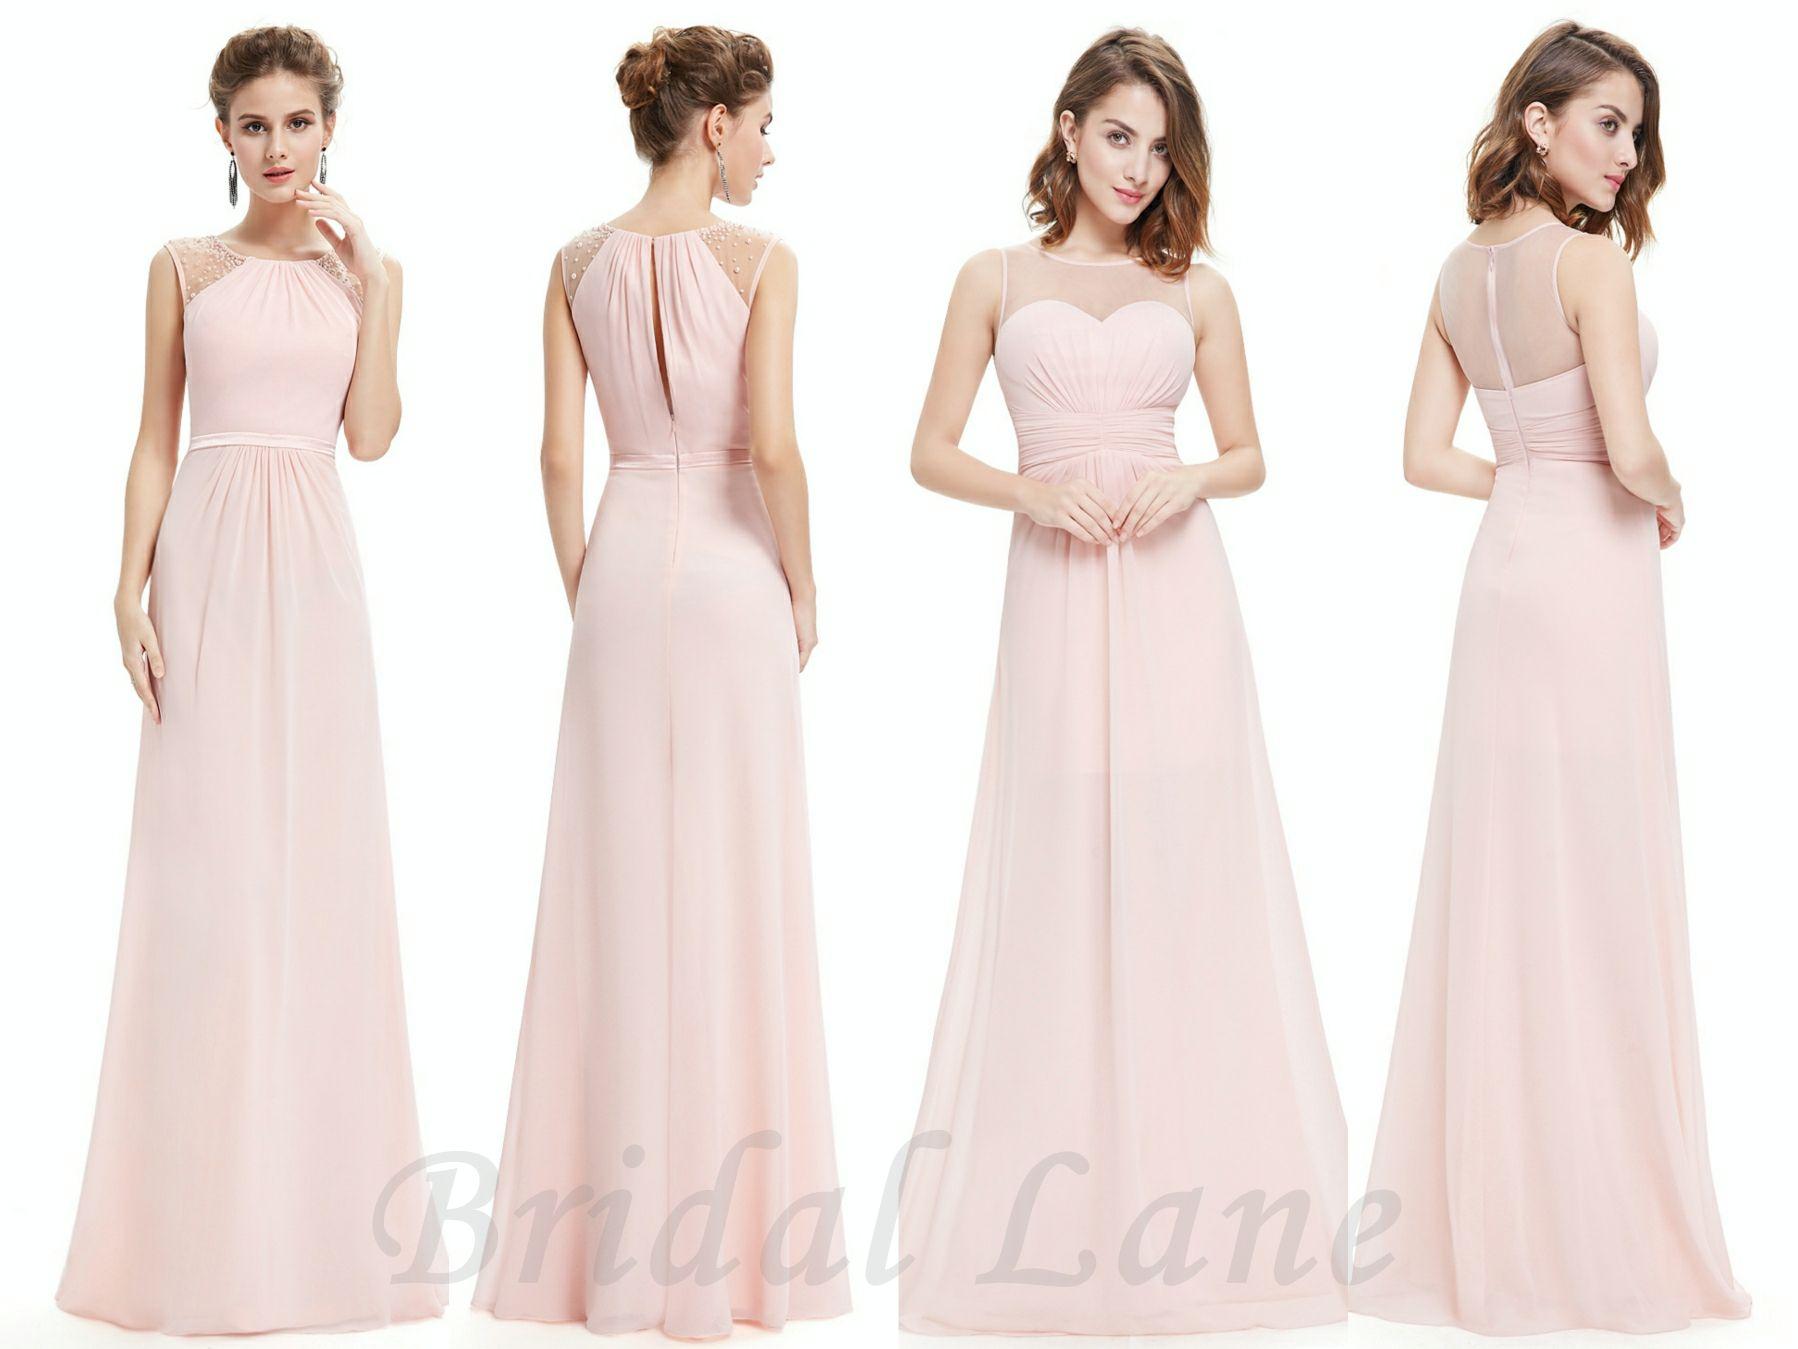 Small Of Blush Pink Bridesmaid Dresses